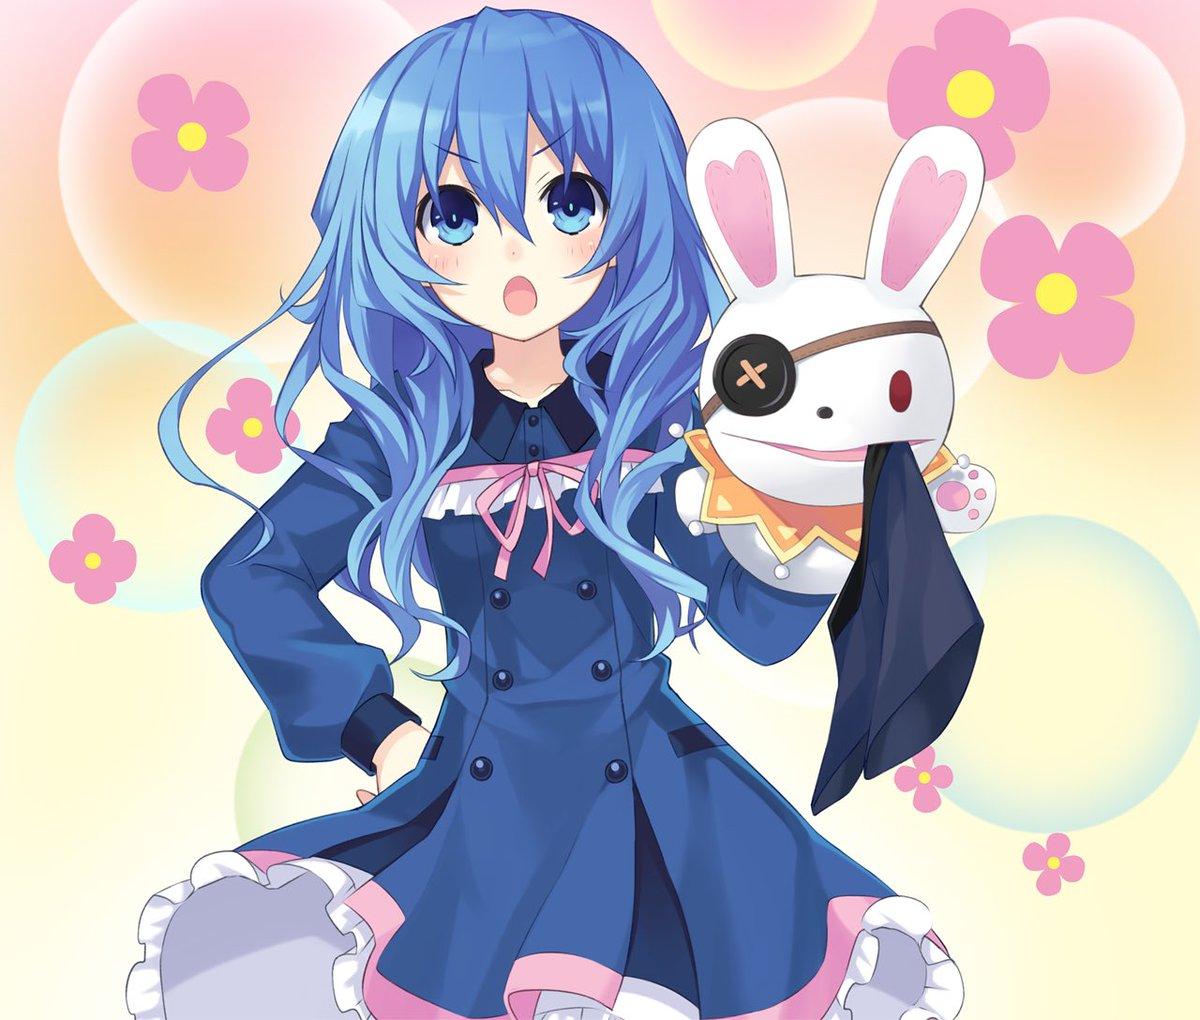 Jonathan gf97 on twitter cute little anime girl anime cute